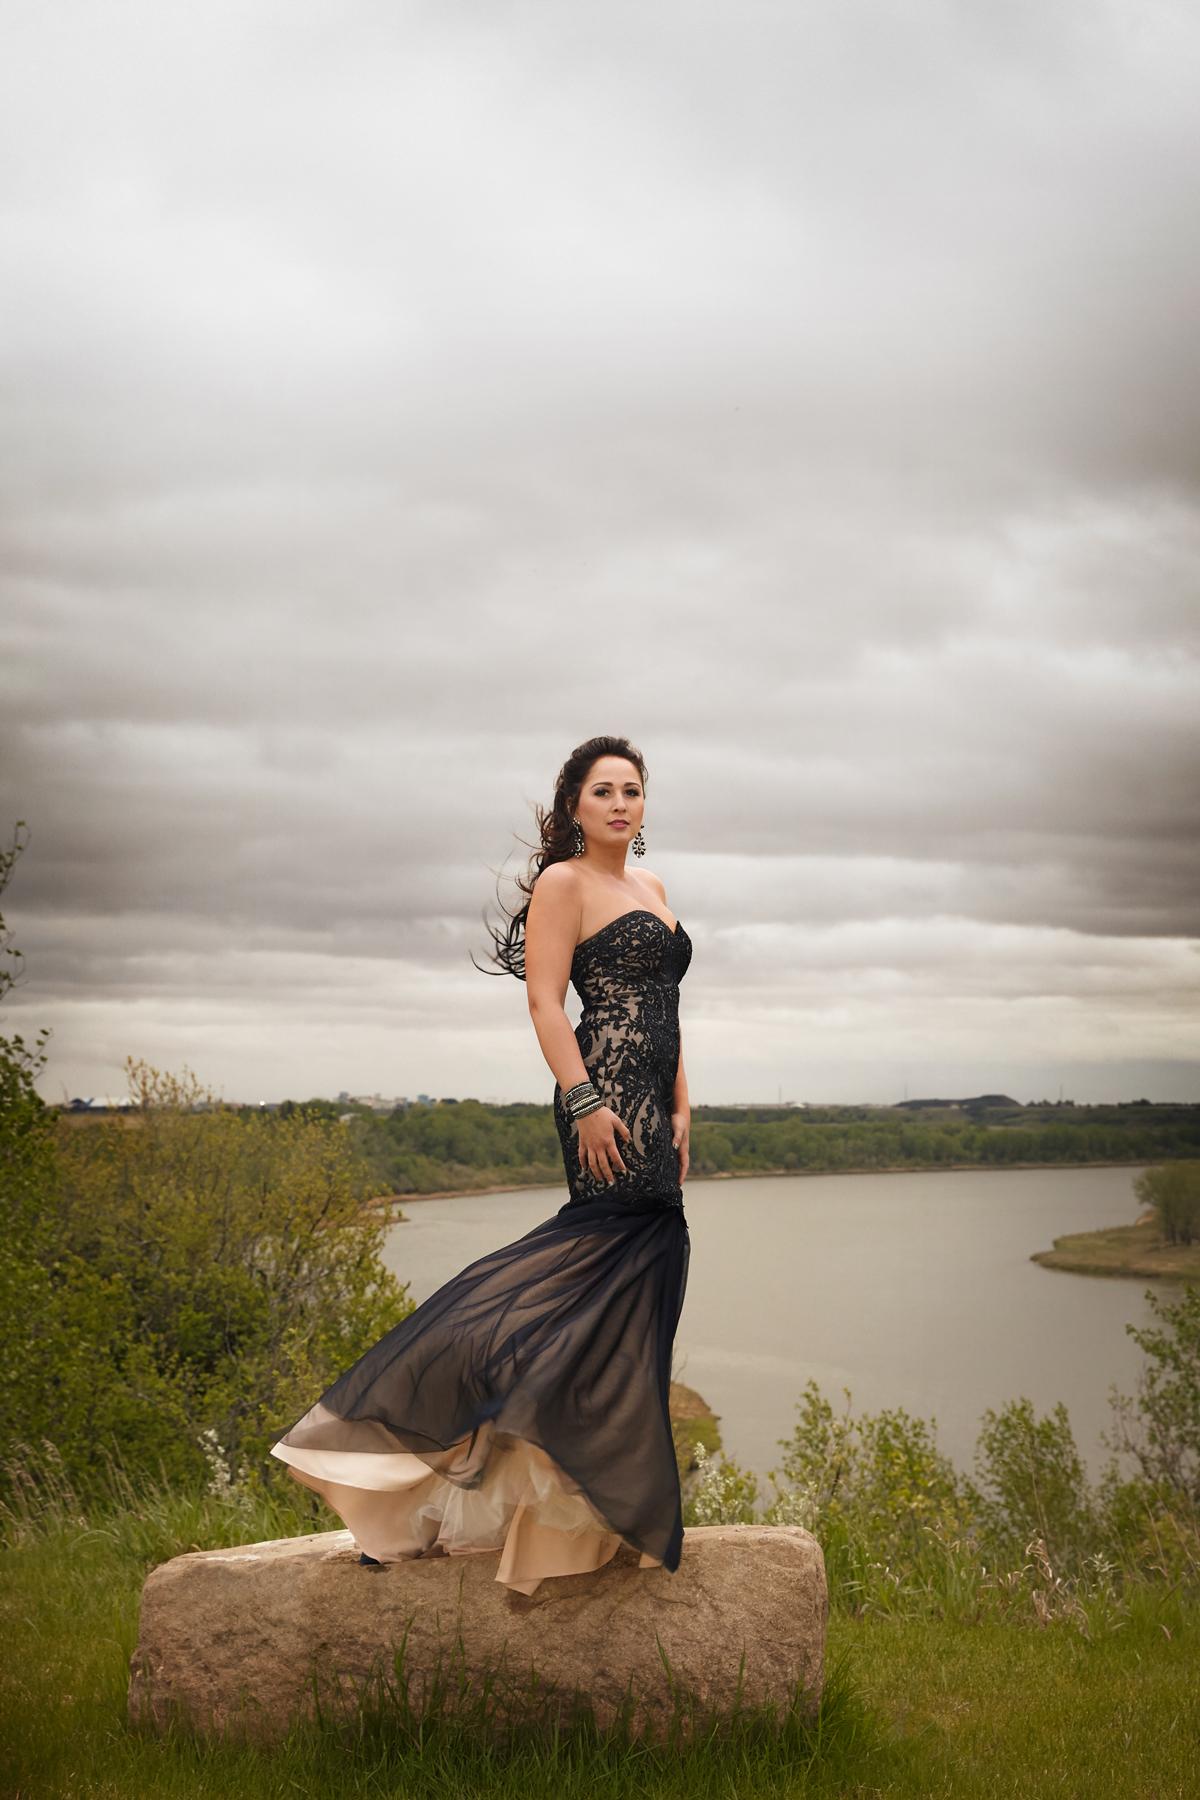 cindy-moleski-professional-photographer-saskatoon-saskatchewan-grad-graduate-graduation-prom-29172-8769e.jpg